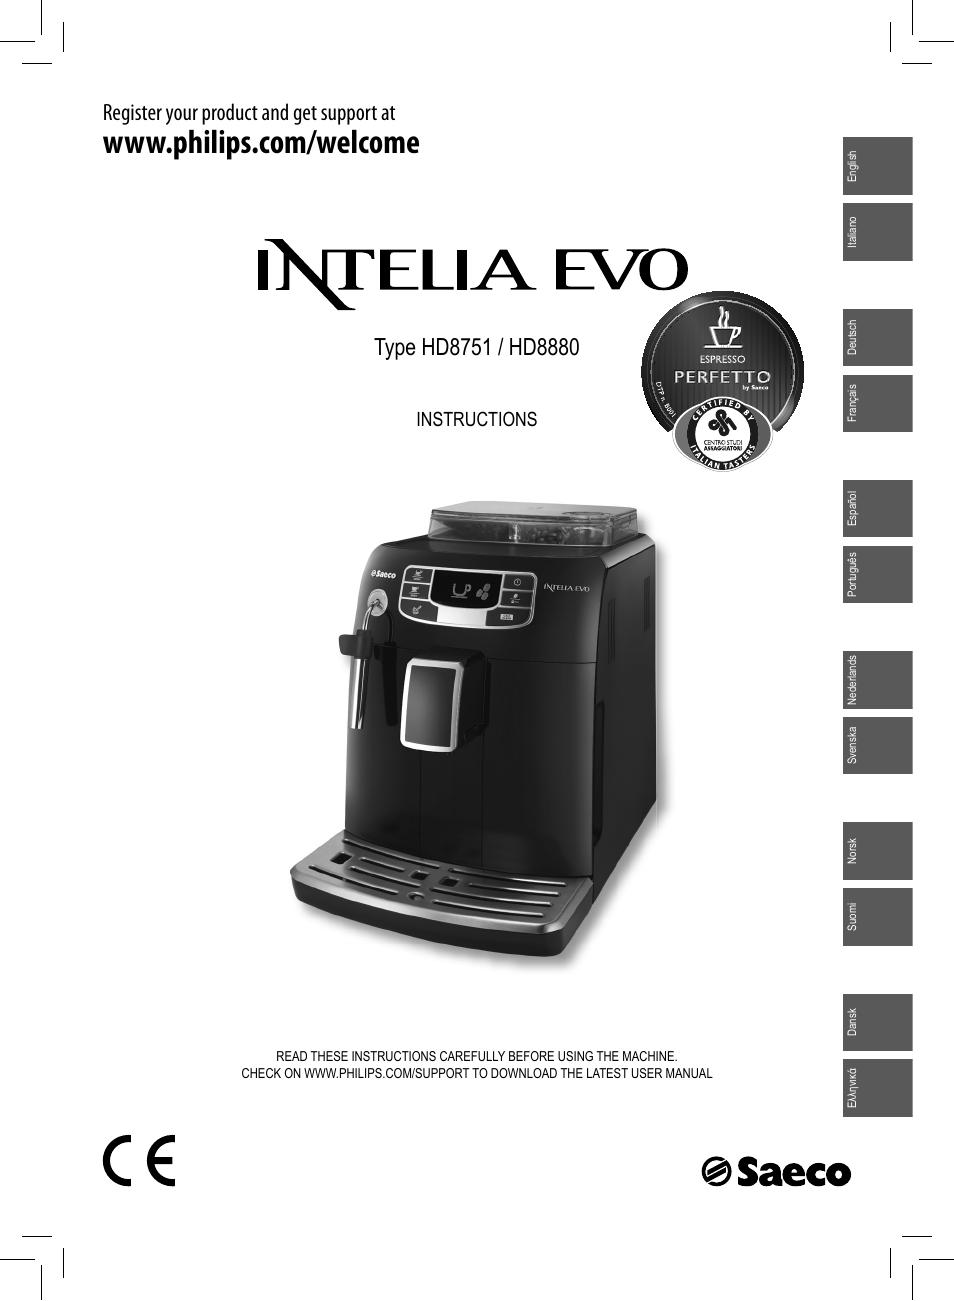 philips saeco intelia evo machine espresso super automatique user rh manualsdir com Philips TV User Manual Philips TV Manual